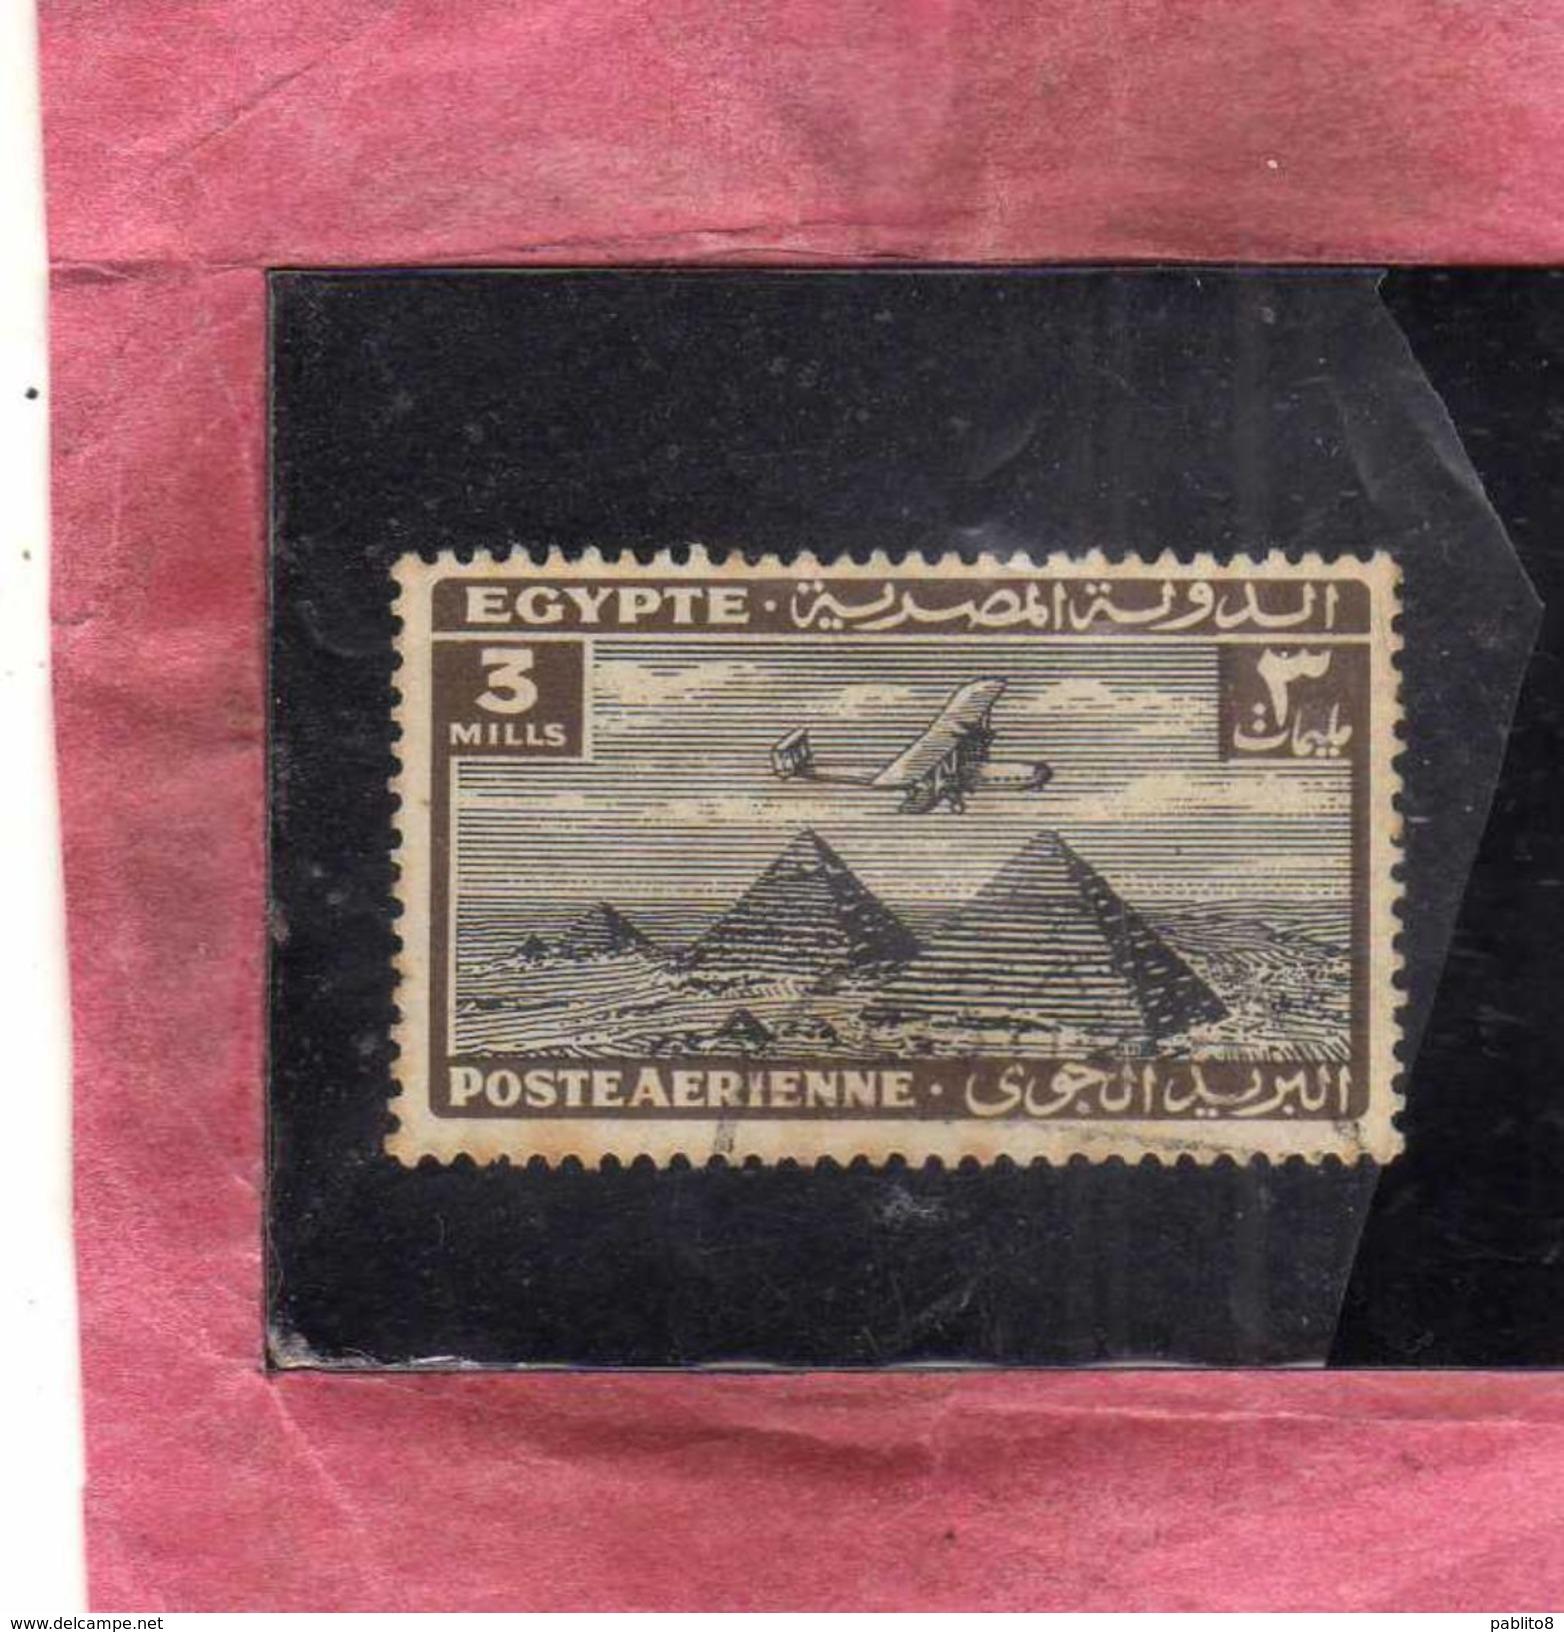 EGYPT EGITTO 1933 1938 AIR MAIL POSTA AEREA AIRPLANE OVER GIZA PYRAMIDS 3m USATO USED OBLITERE' - Posta Aerea